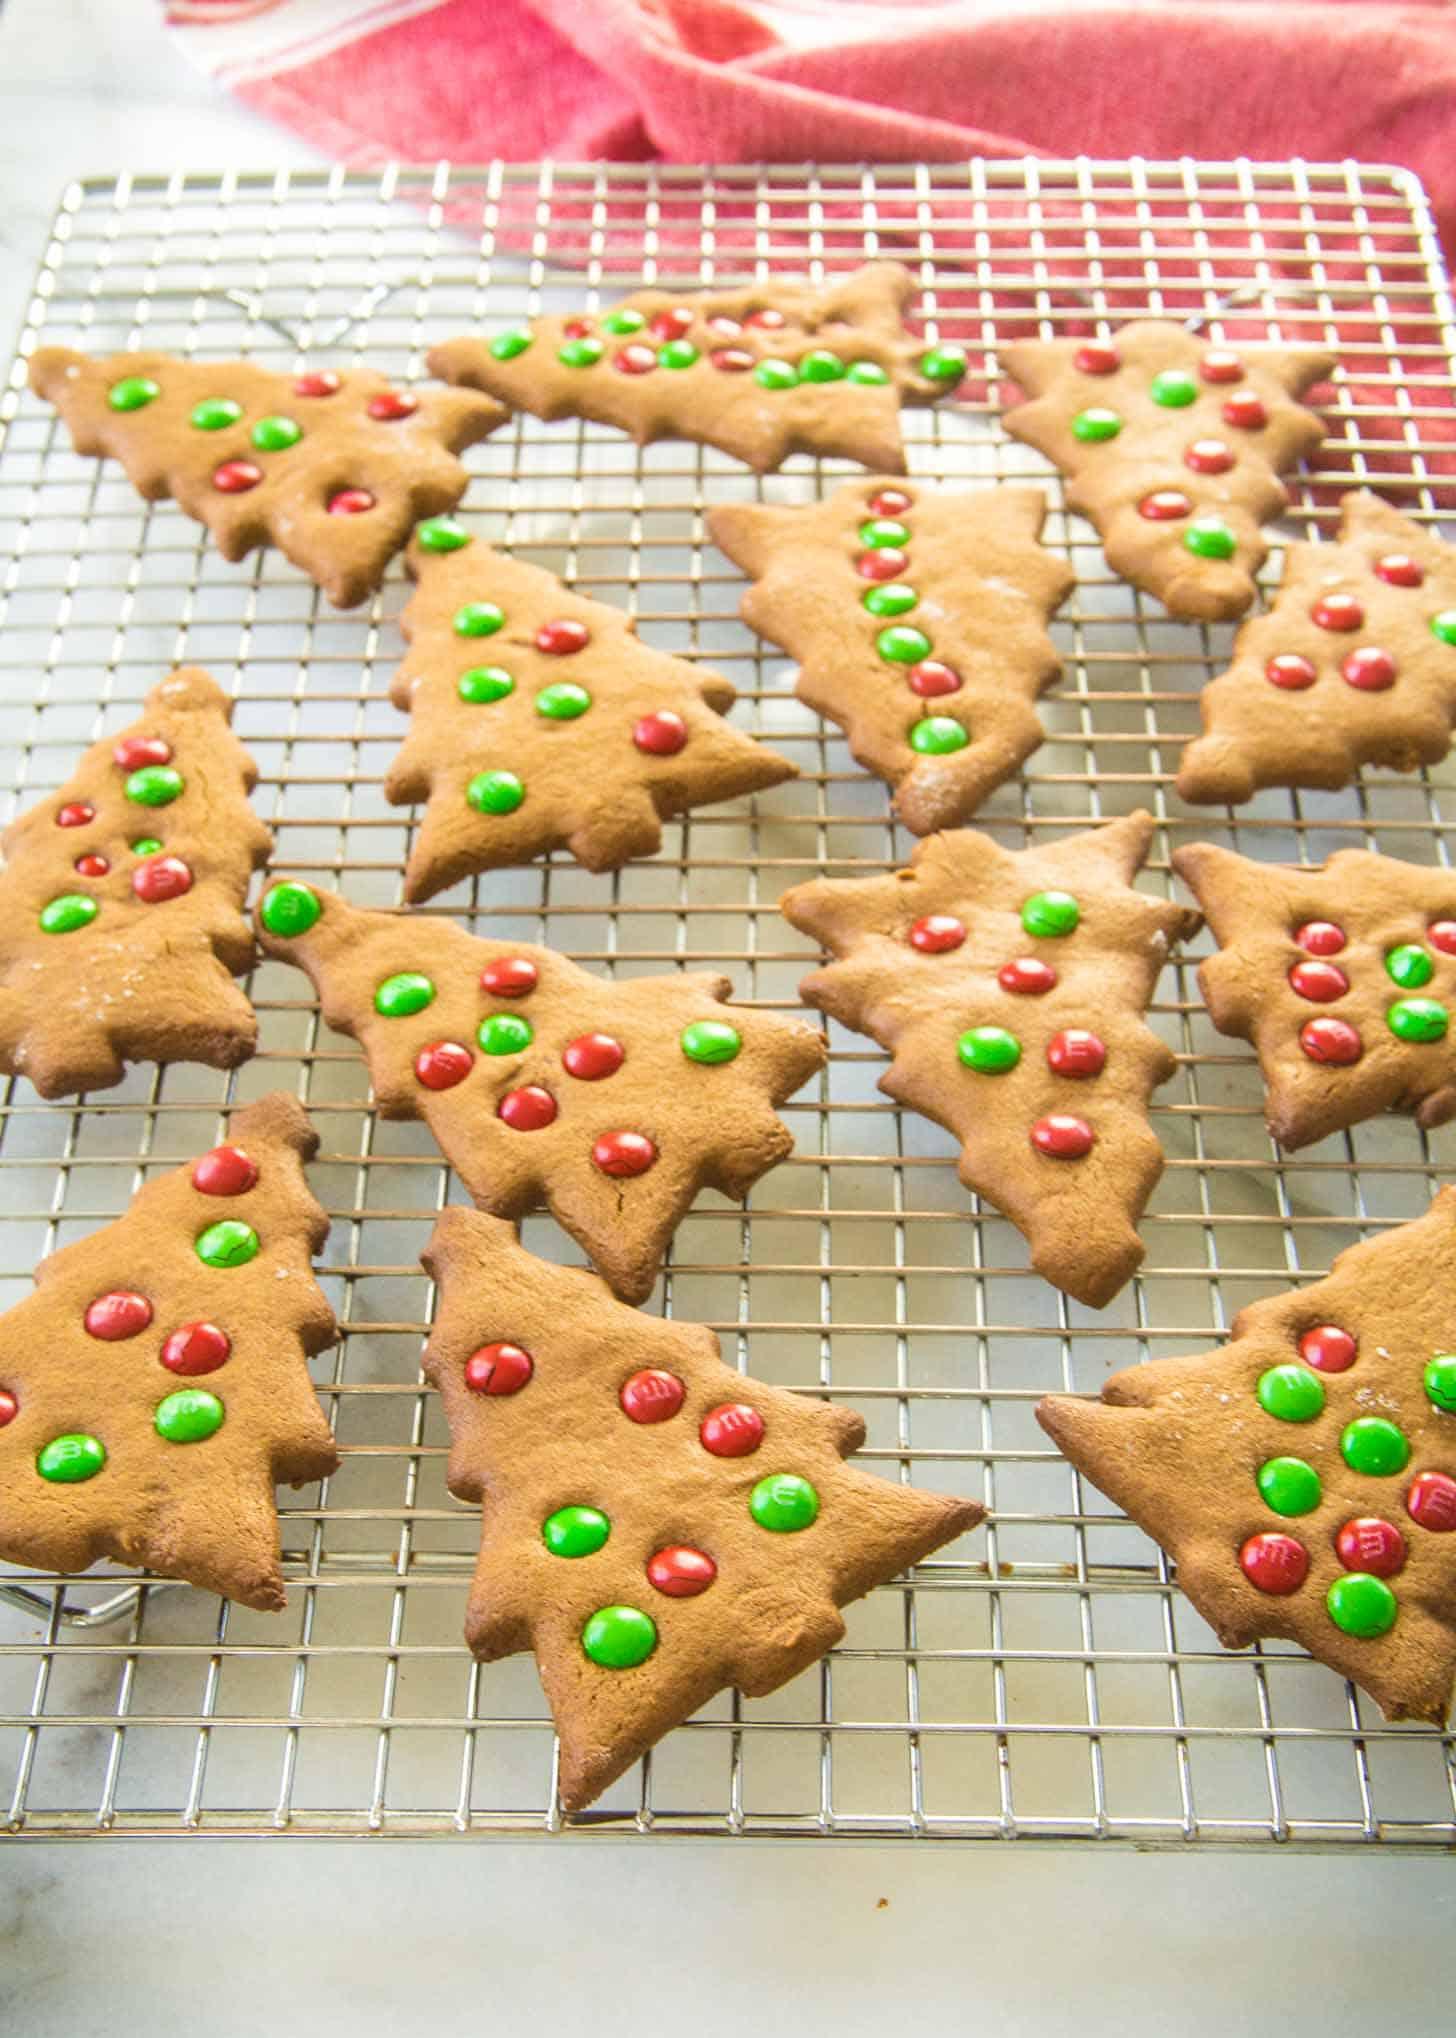 Crisp Gingerbread Cookies on a cooling rack